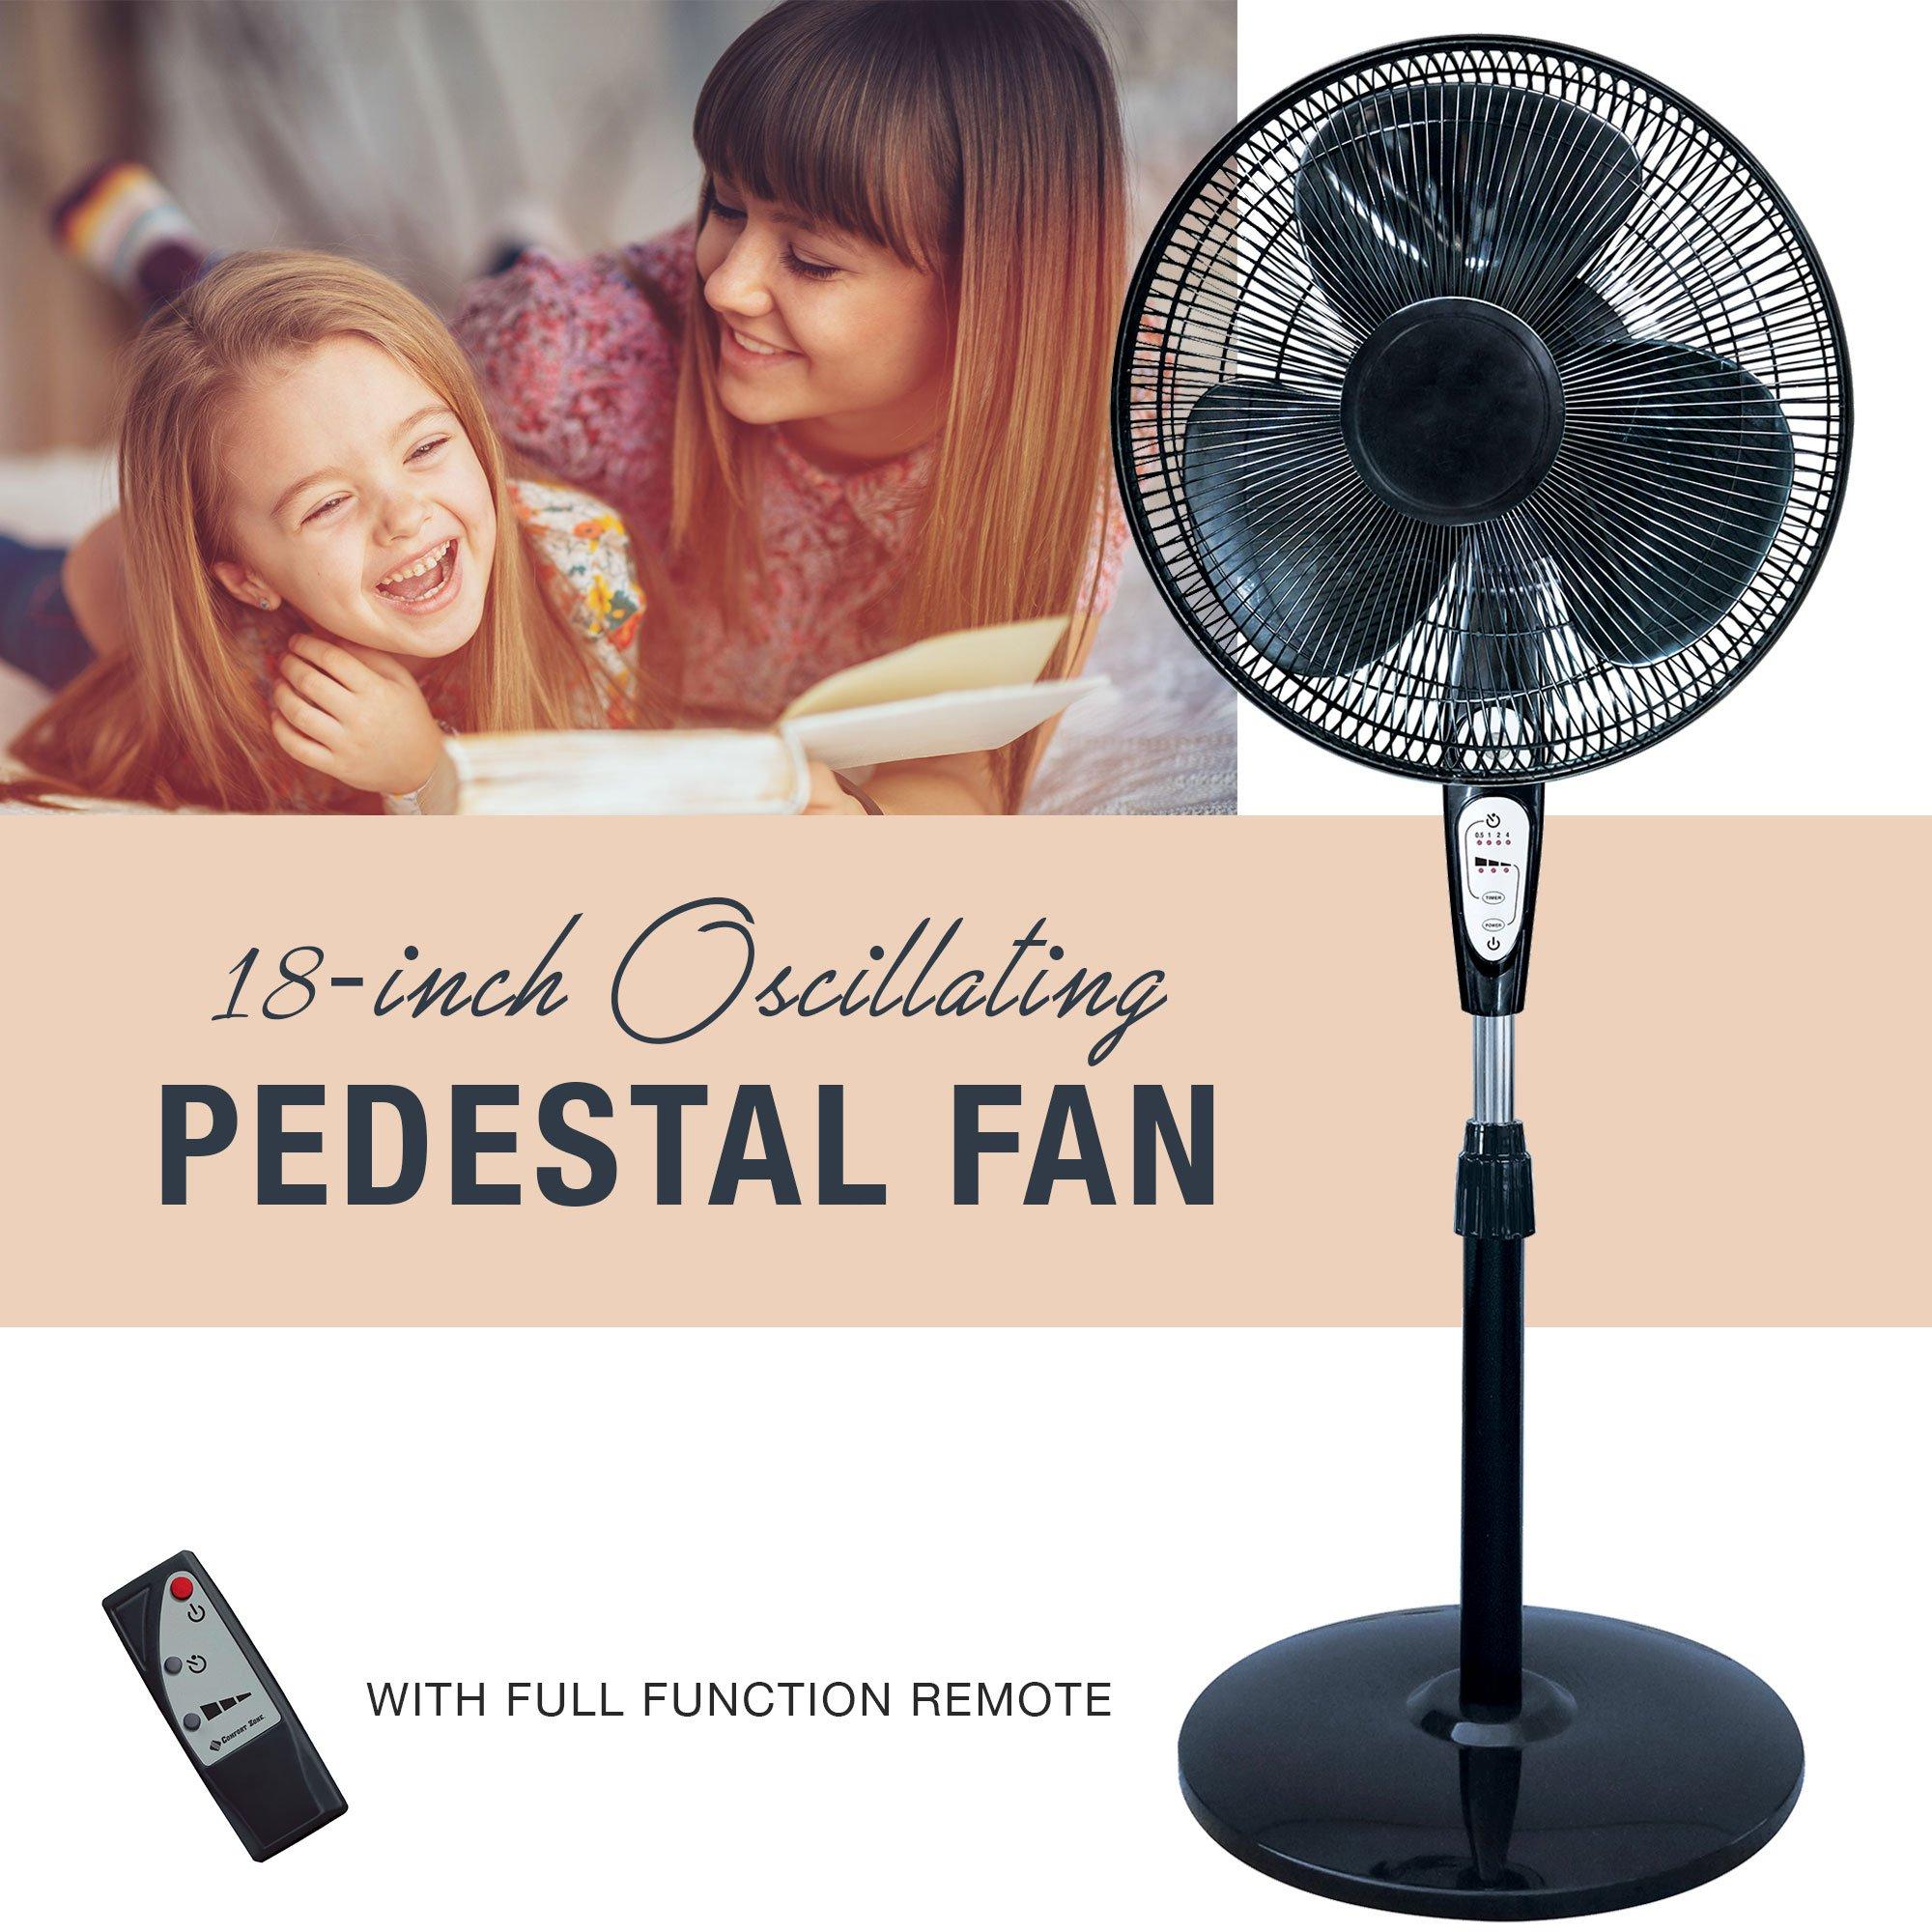 3 Speed Oscillating 18 Inch Pedestal Fan with Remote Control, Adjustable Tilt with Metal Grilles, Black